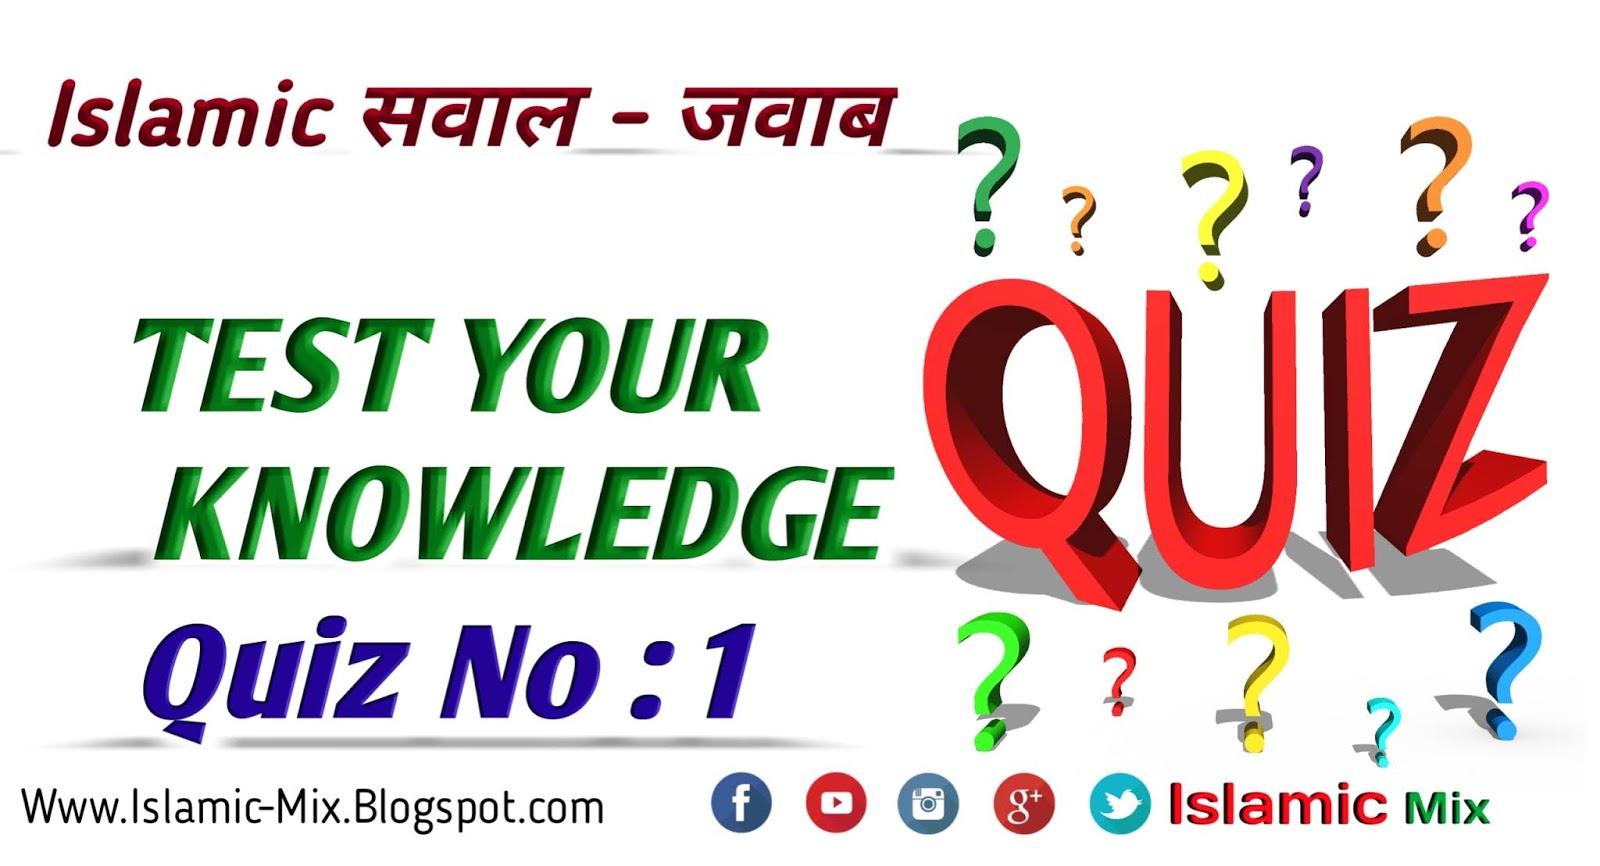 Islamic quiz no 1 - Sawal jawab islam urdu quiz - Islamicweb site